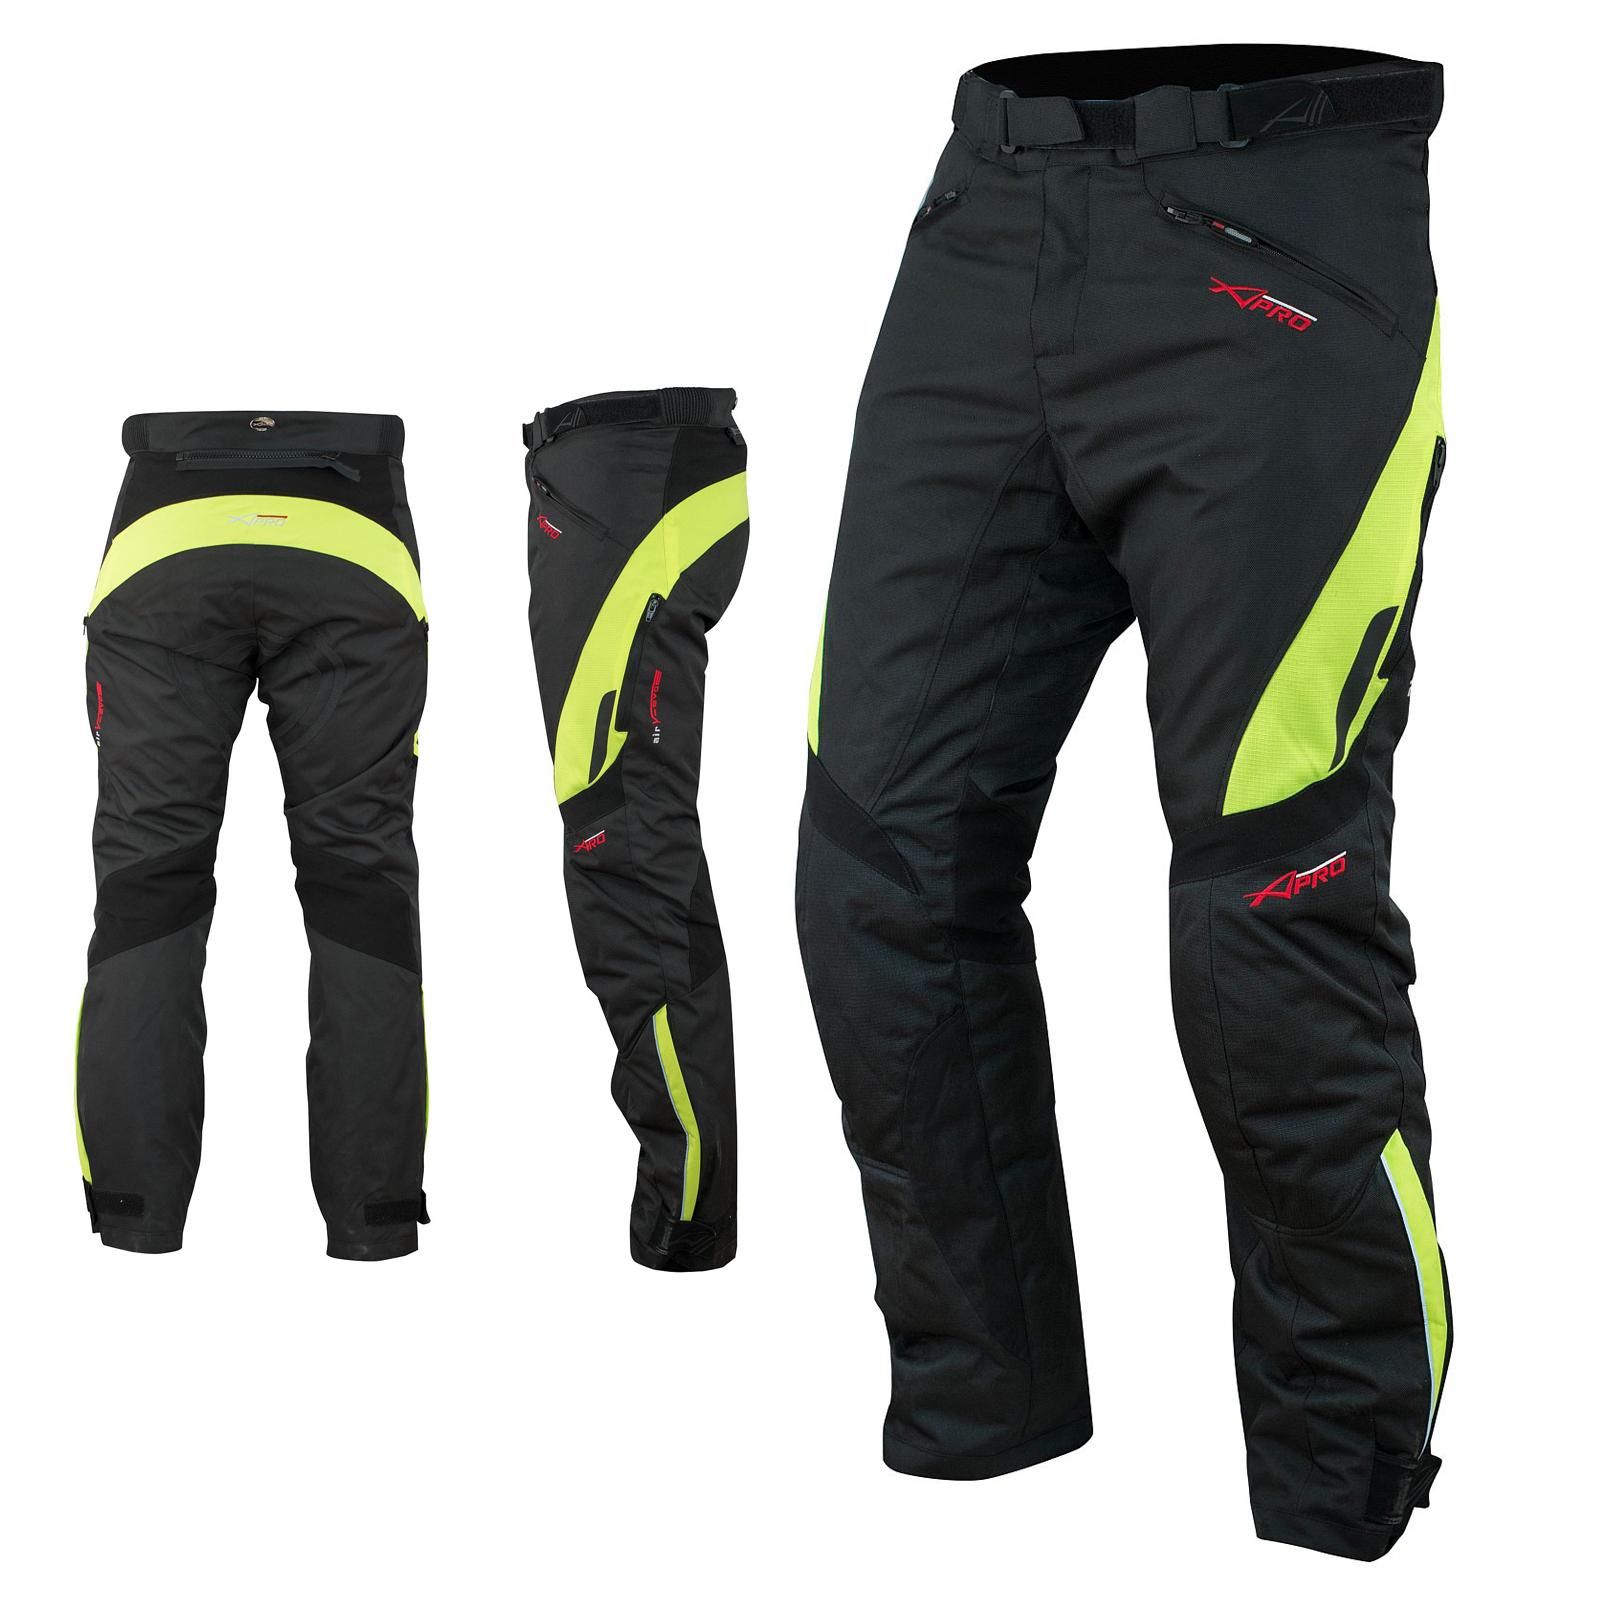 Pantaloni-Donna-Impermeabile-Moto-Imbottitura-Termica-Traspirante-Fluo miniatura 5